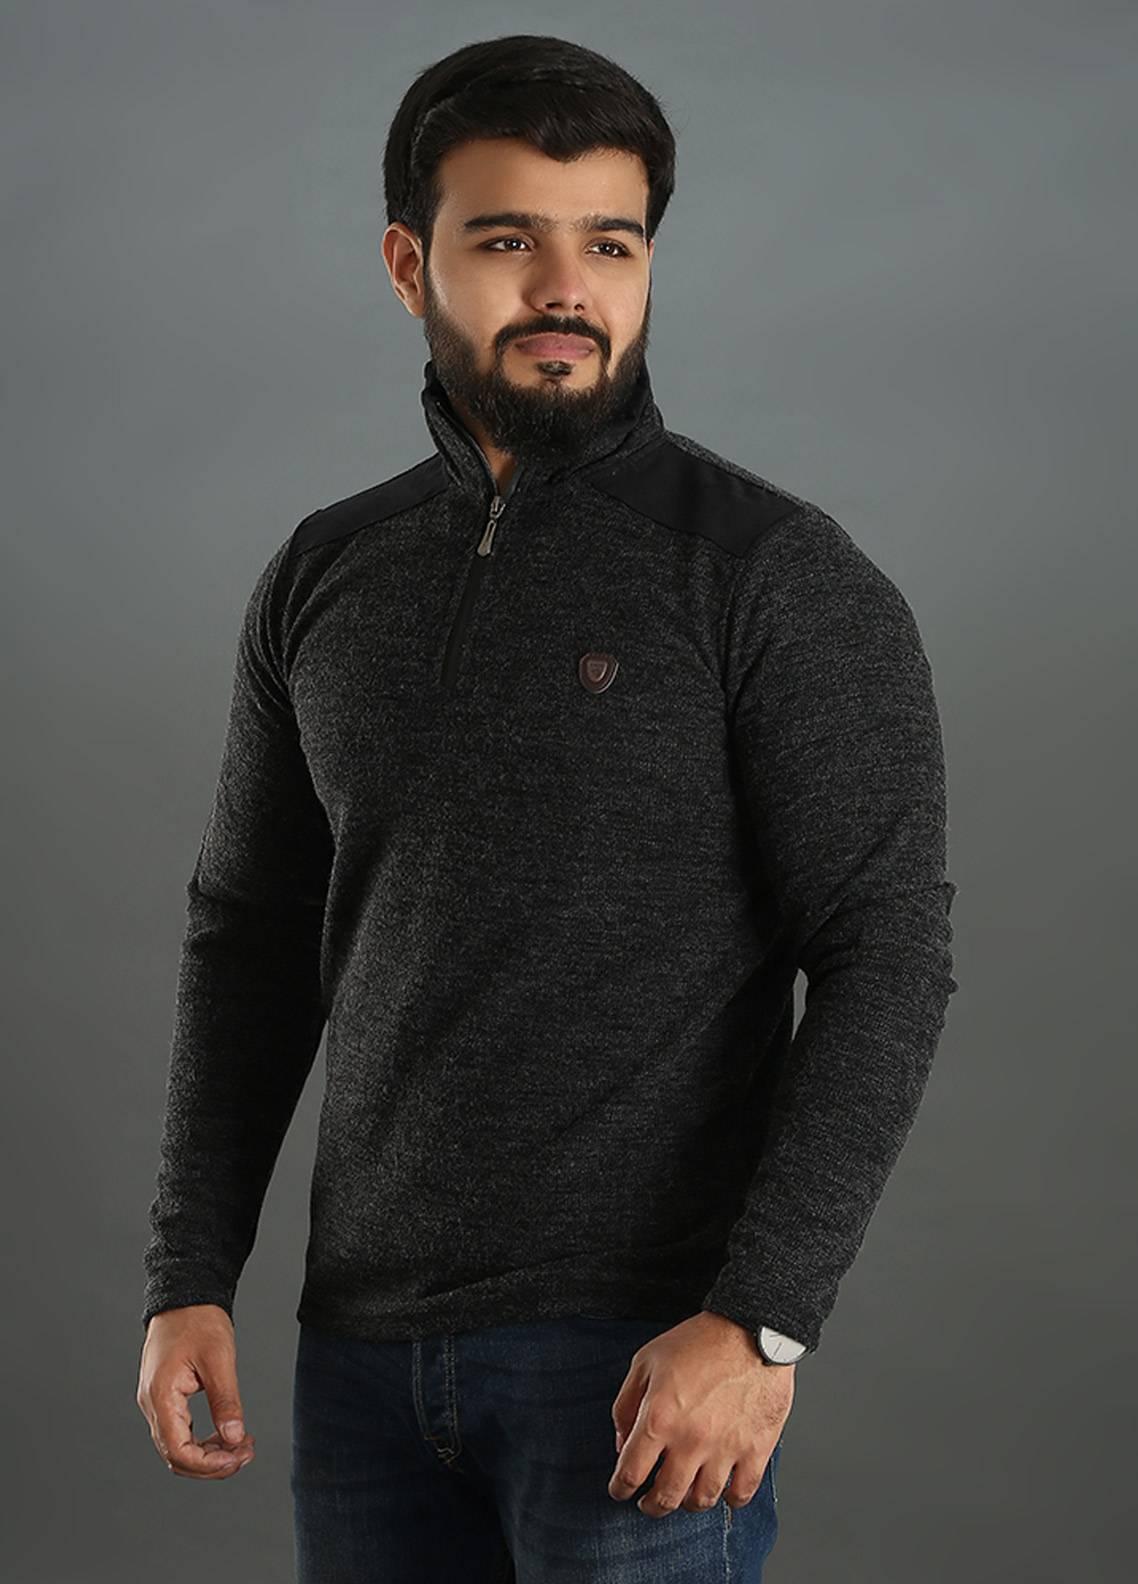 Sanaulla Exclusive Range Jersey Full Sleeves Tees for Men - Black SAM18TS 17